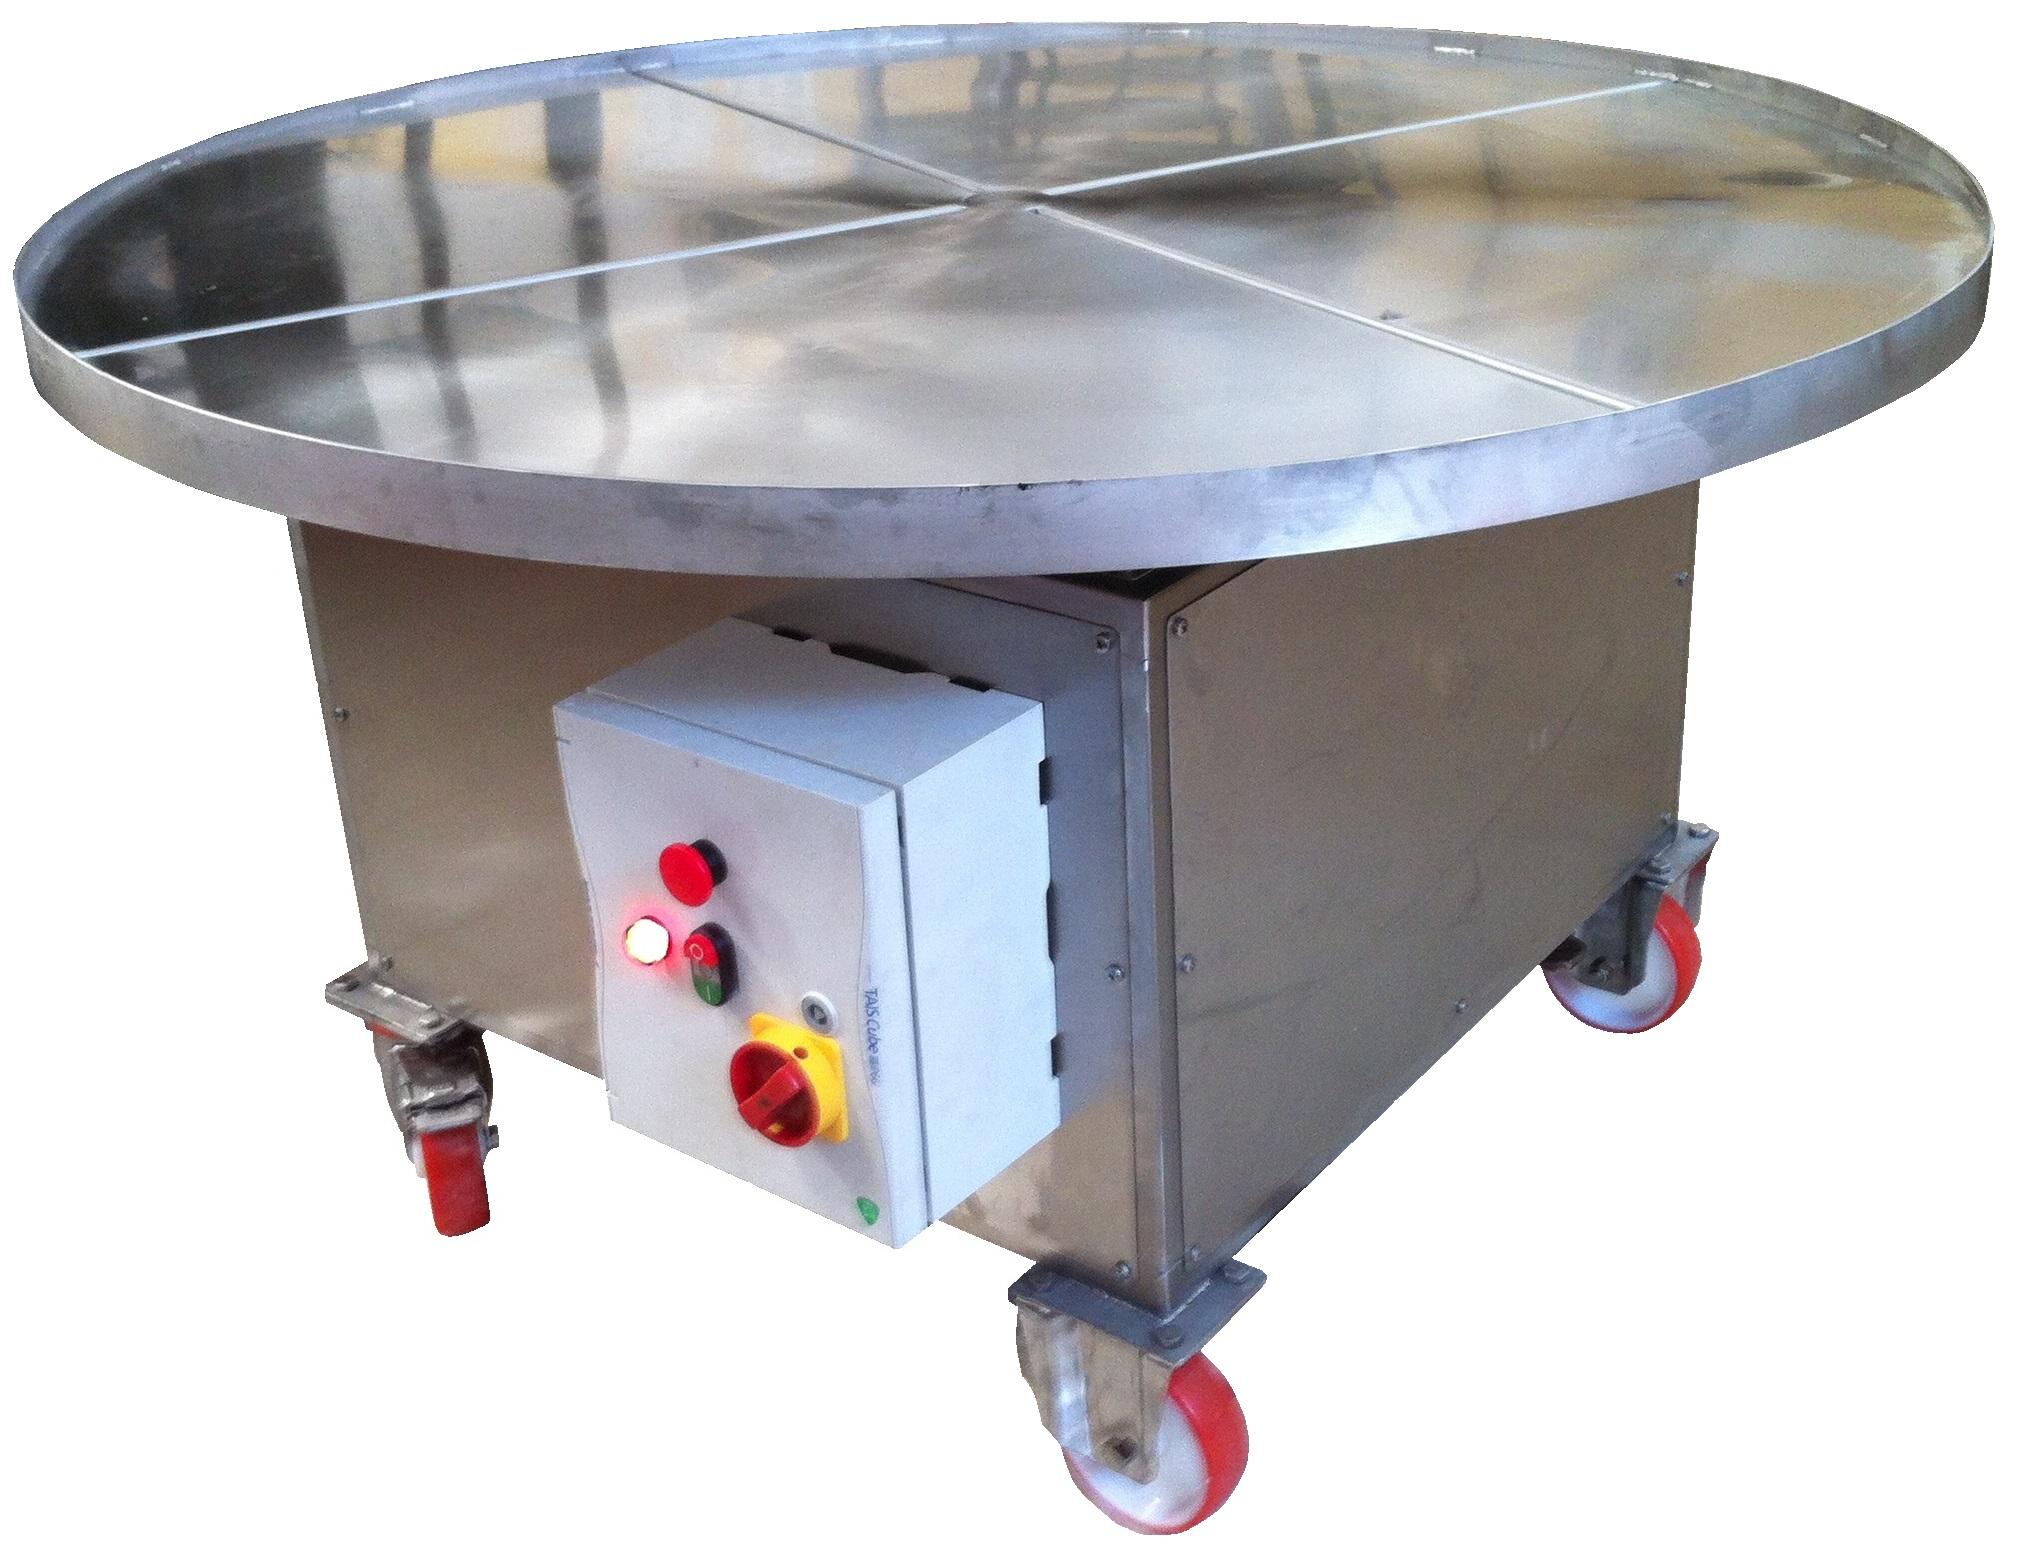 Tavola rotante tes macchine alimentari - Meccanismo rotante per tavolo ...